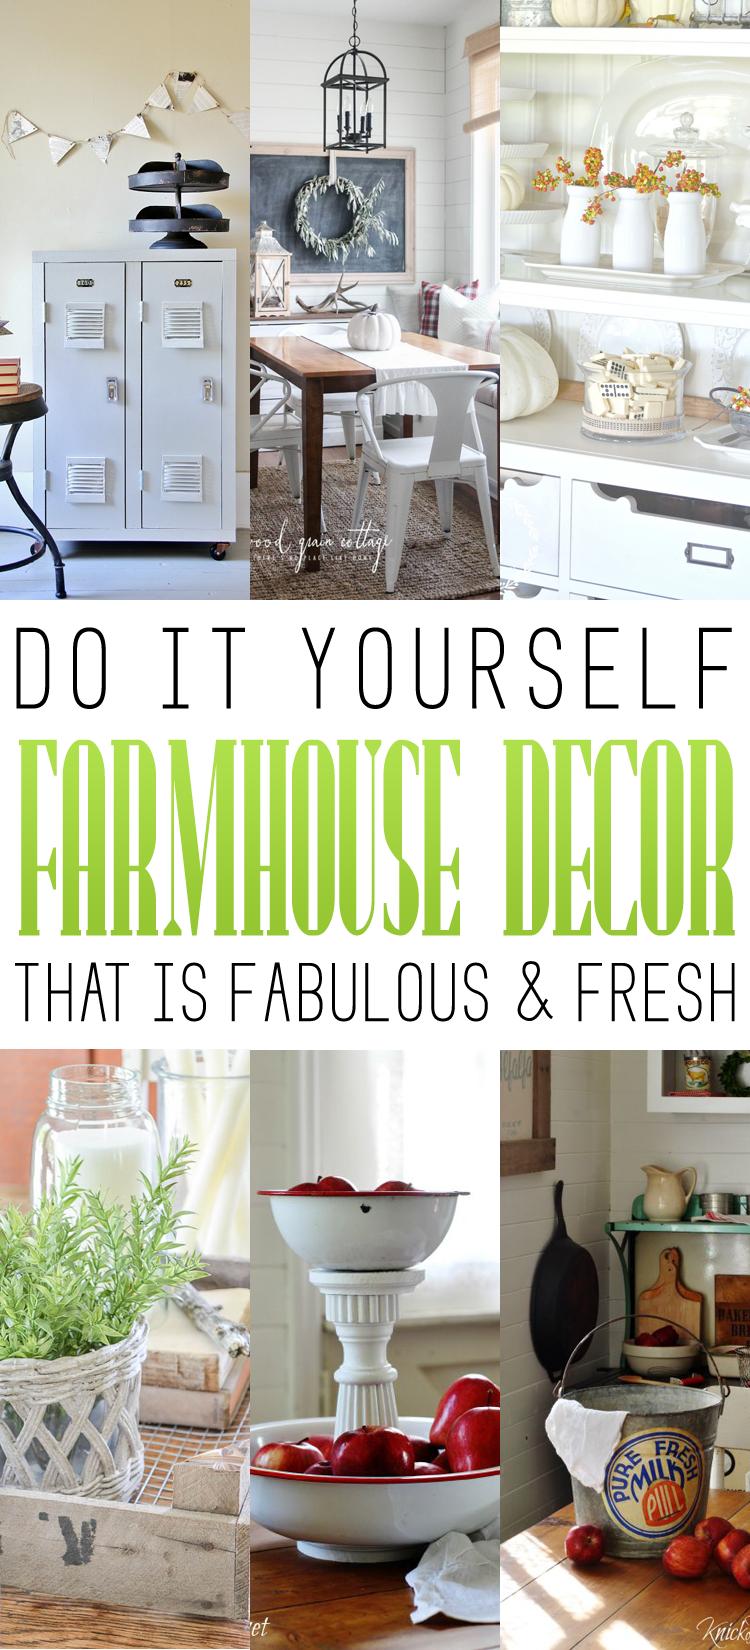 DIY Farmhouse Decor that is fabulous and fresh